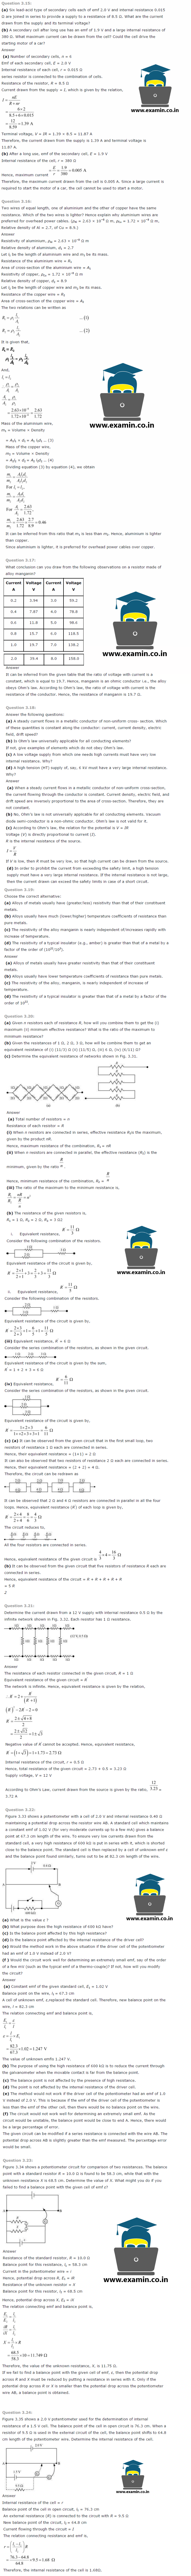 NCERT Solutions Class 12 Physics Chapter 3